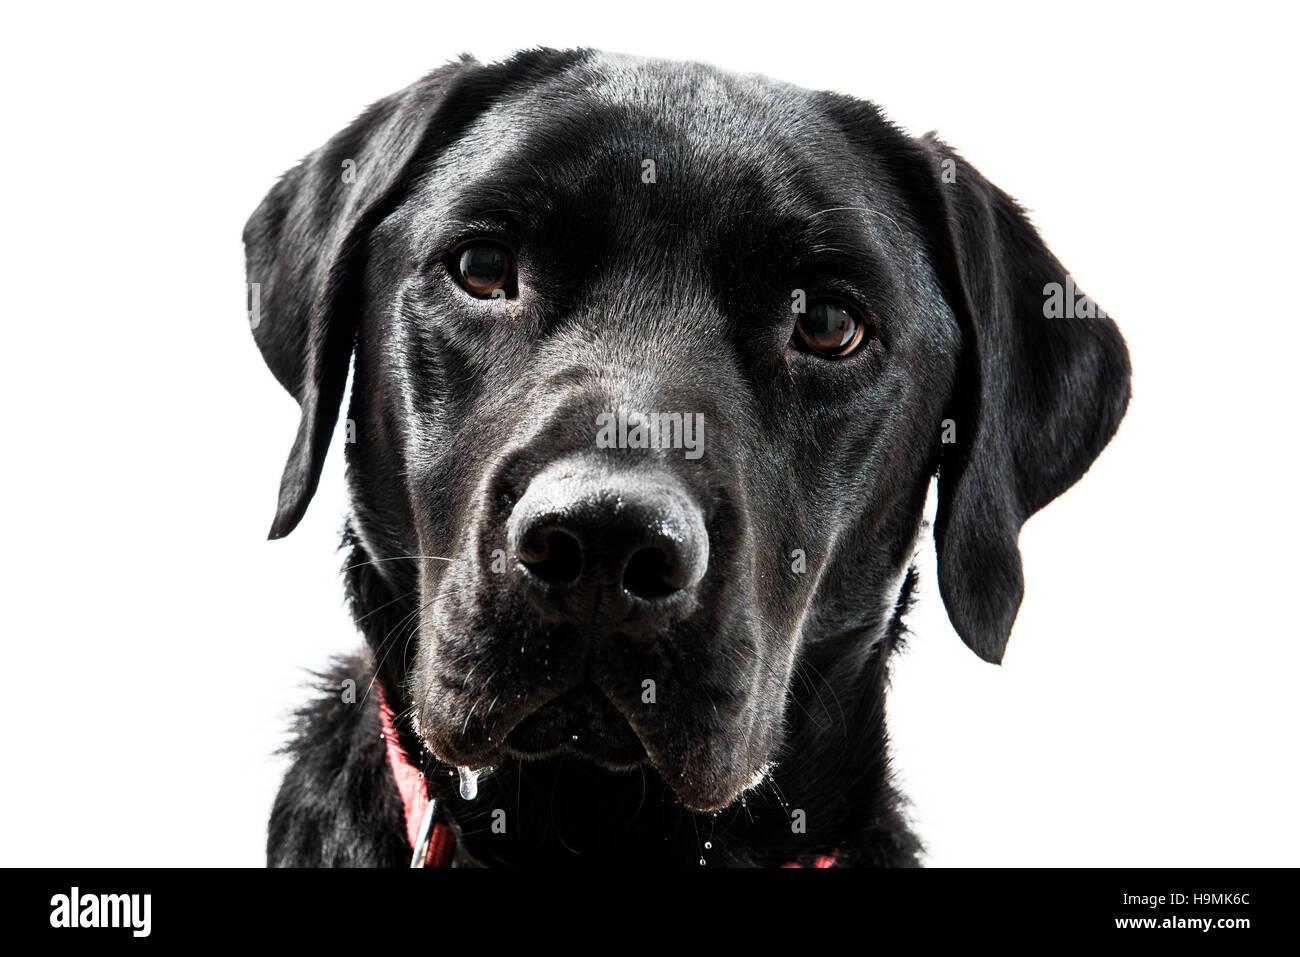 Portrait of a black Labrador dog on a white background - Stock Image